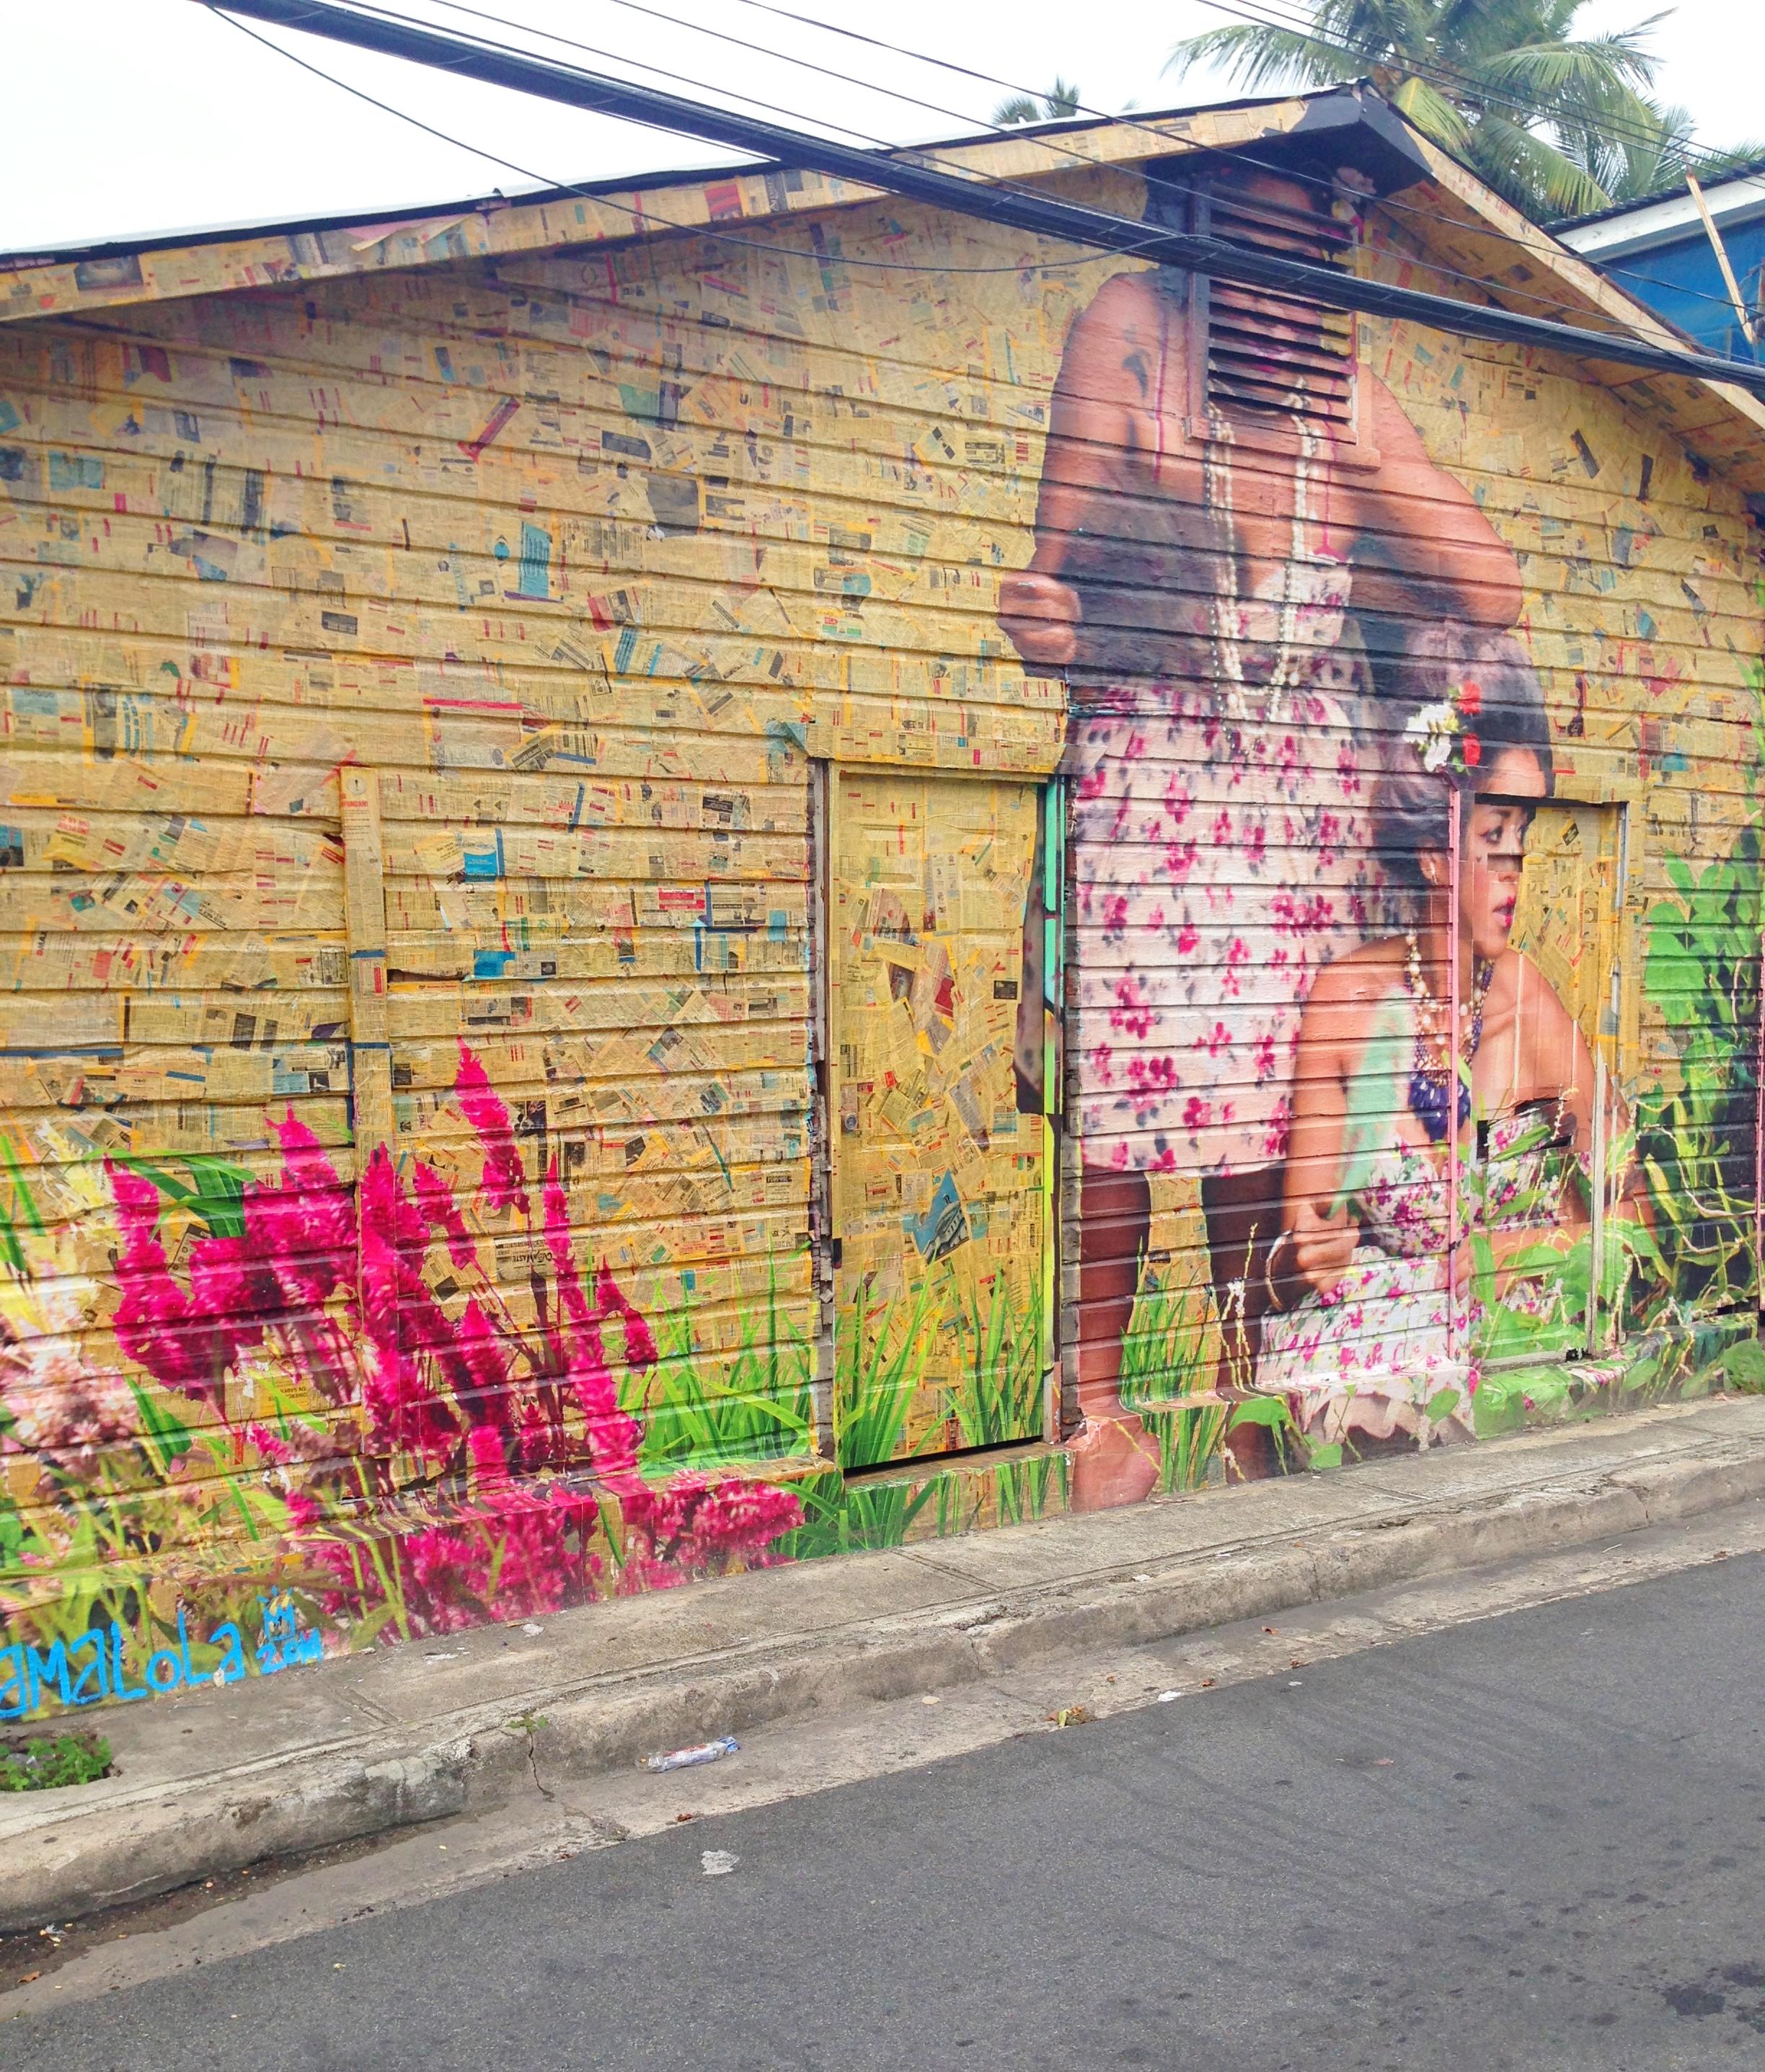 In Saturce es Ley, one of my favorite murals were the ones created by Damaris Cruz (Damalola)